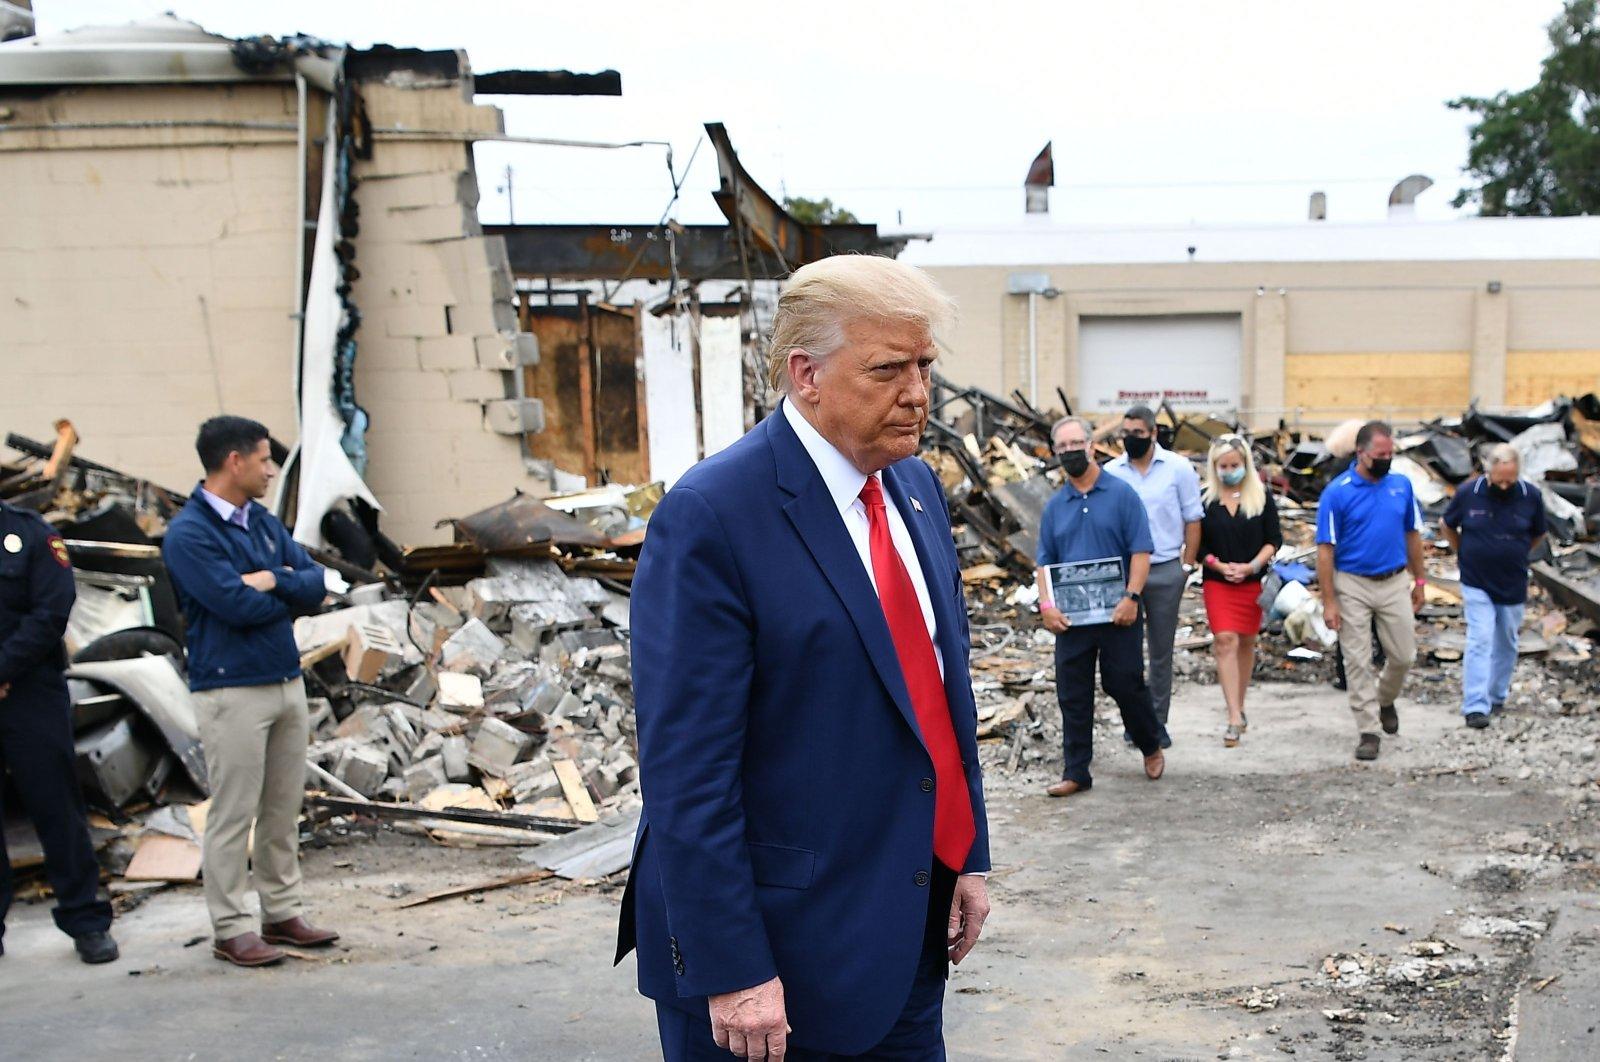 U.S. President Donald Trump tours an area affected by civil unrest, Kenosha, Wisconsin, U.S., Sept. 1, 2020. (AFP Photo)